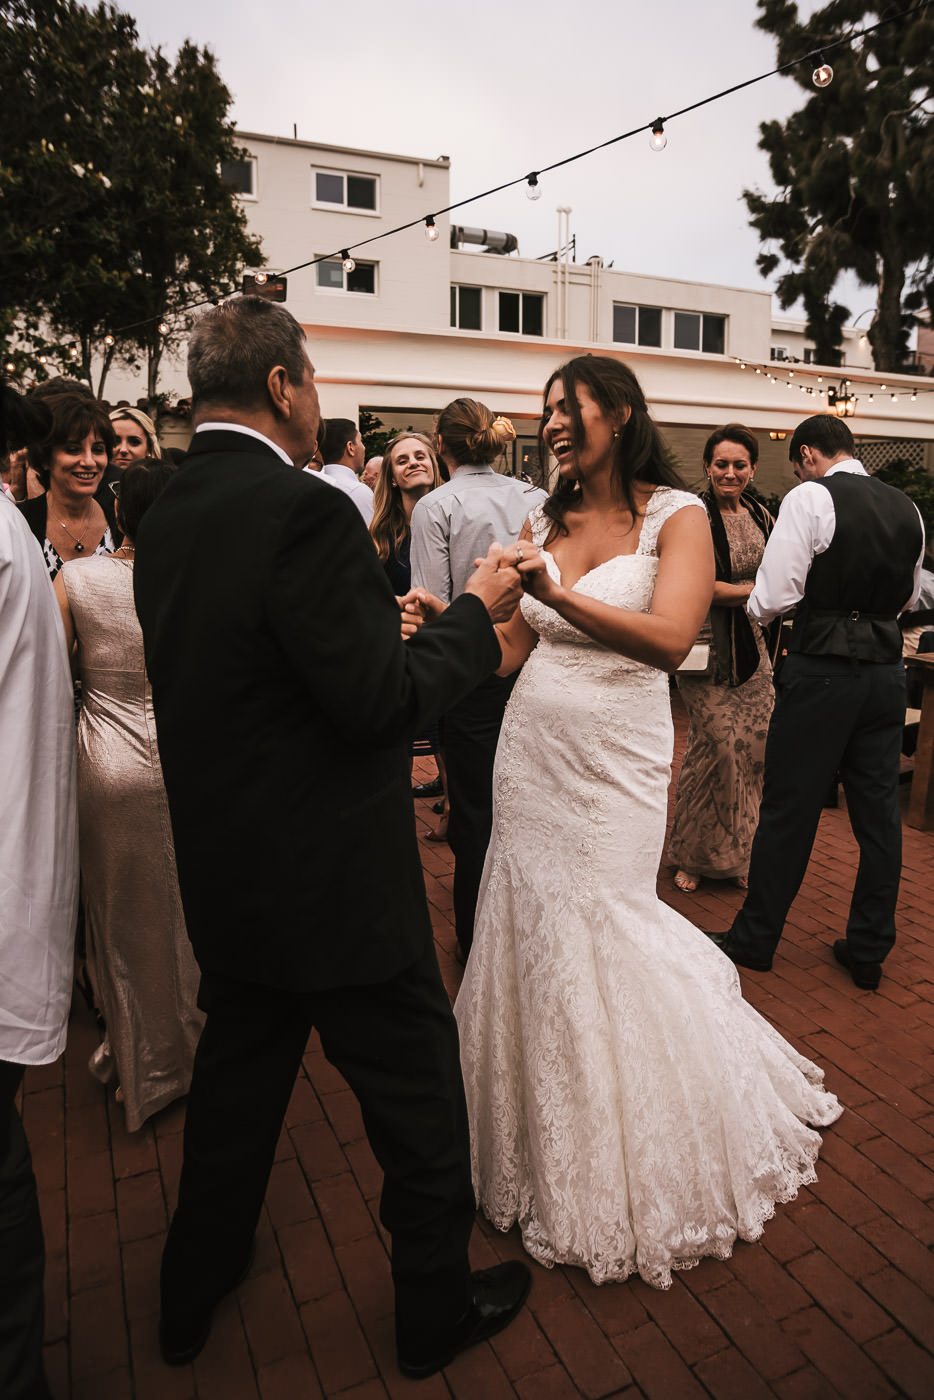 Bride dances with her wedding guests.